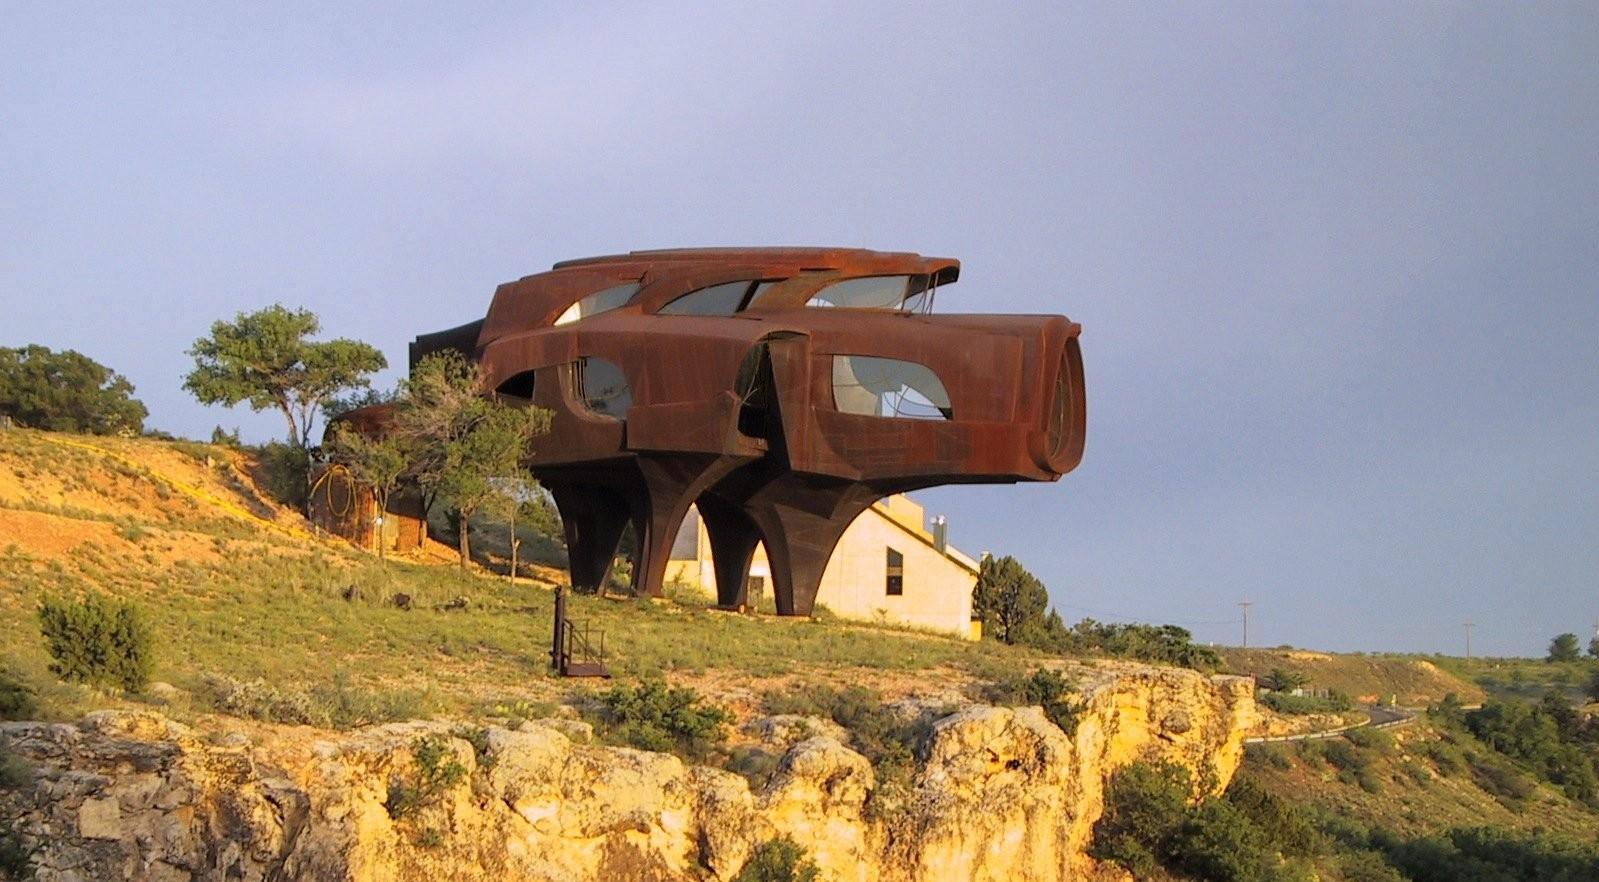 Semangat 'Baja' dalam Arsitektur | Foto artikel Arsitag